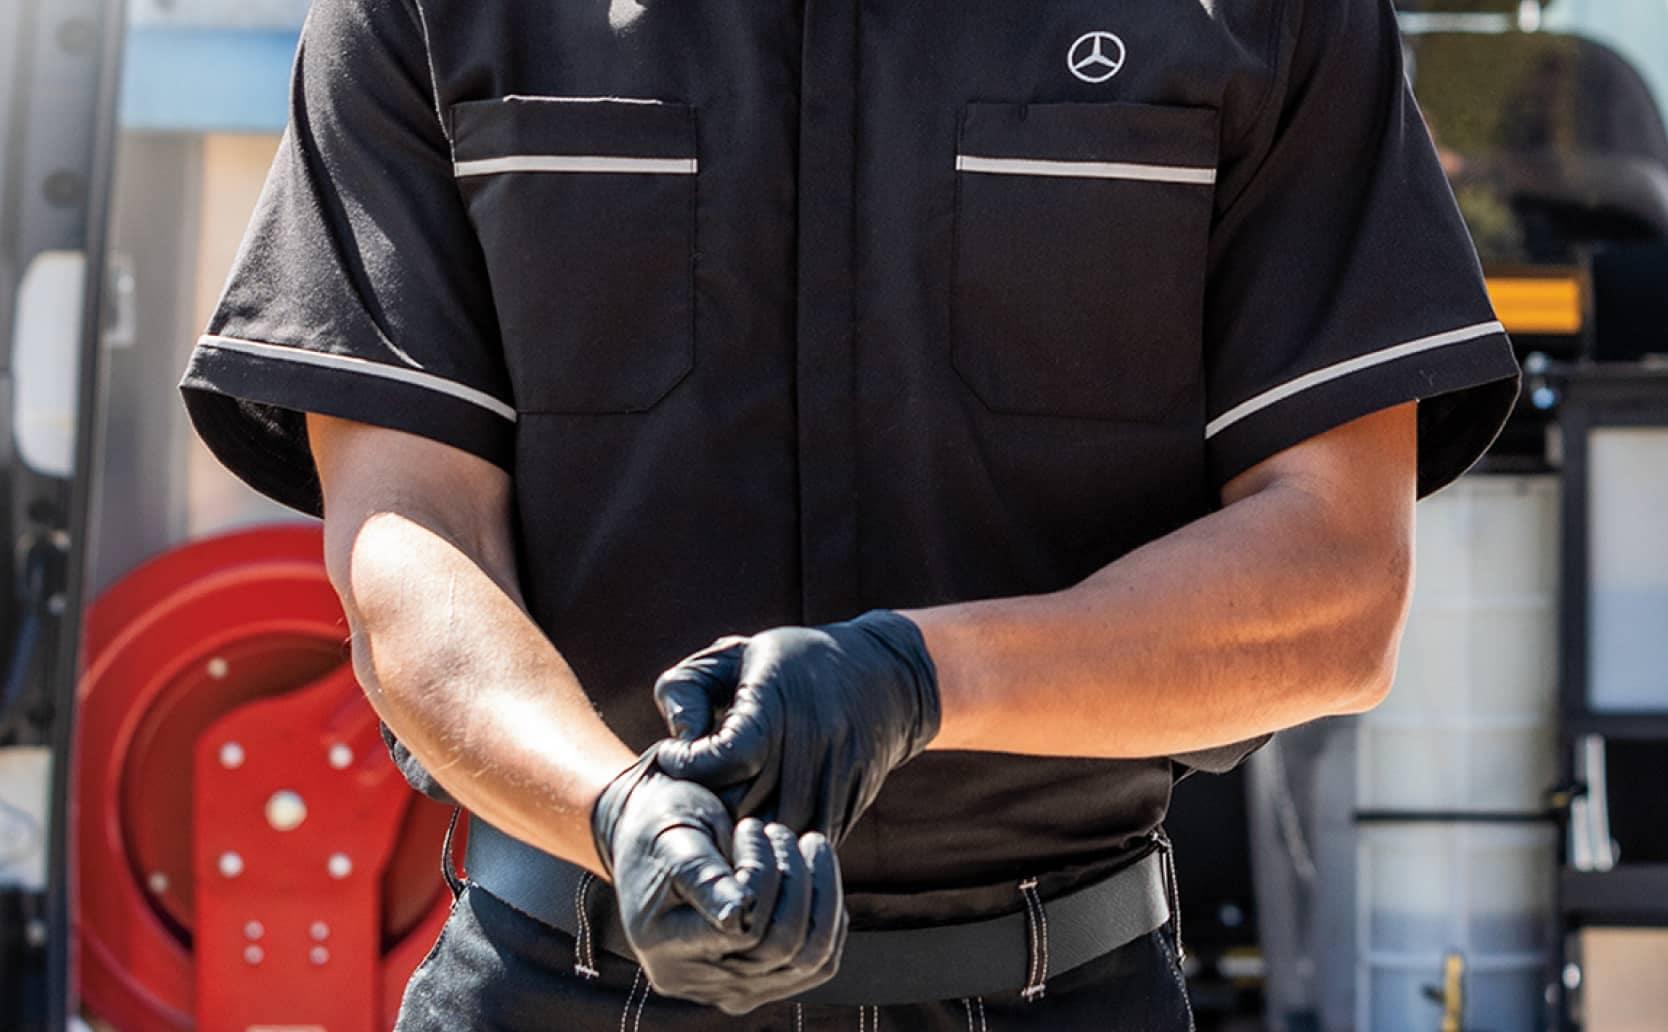 Mercedes-Benz of Foothill Ranch technician